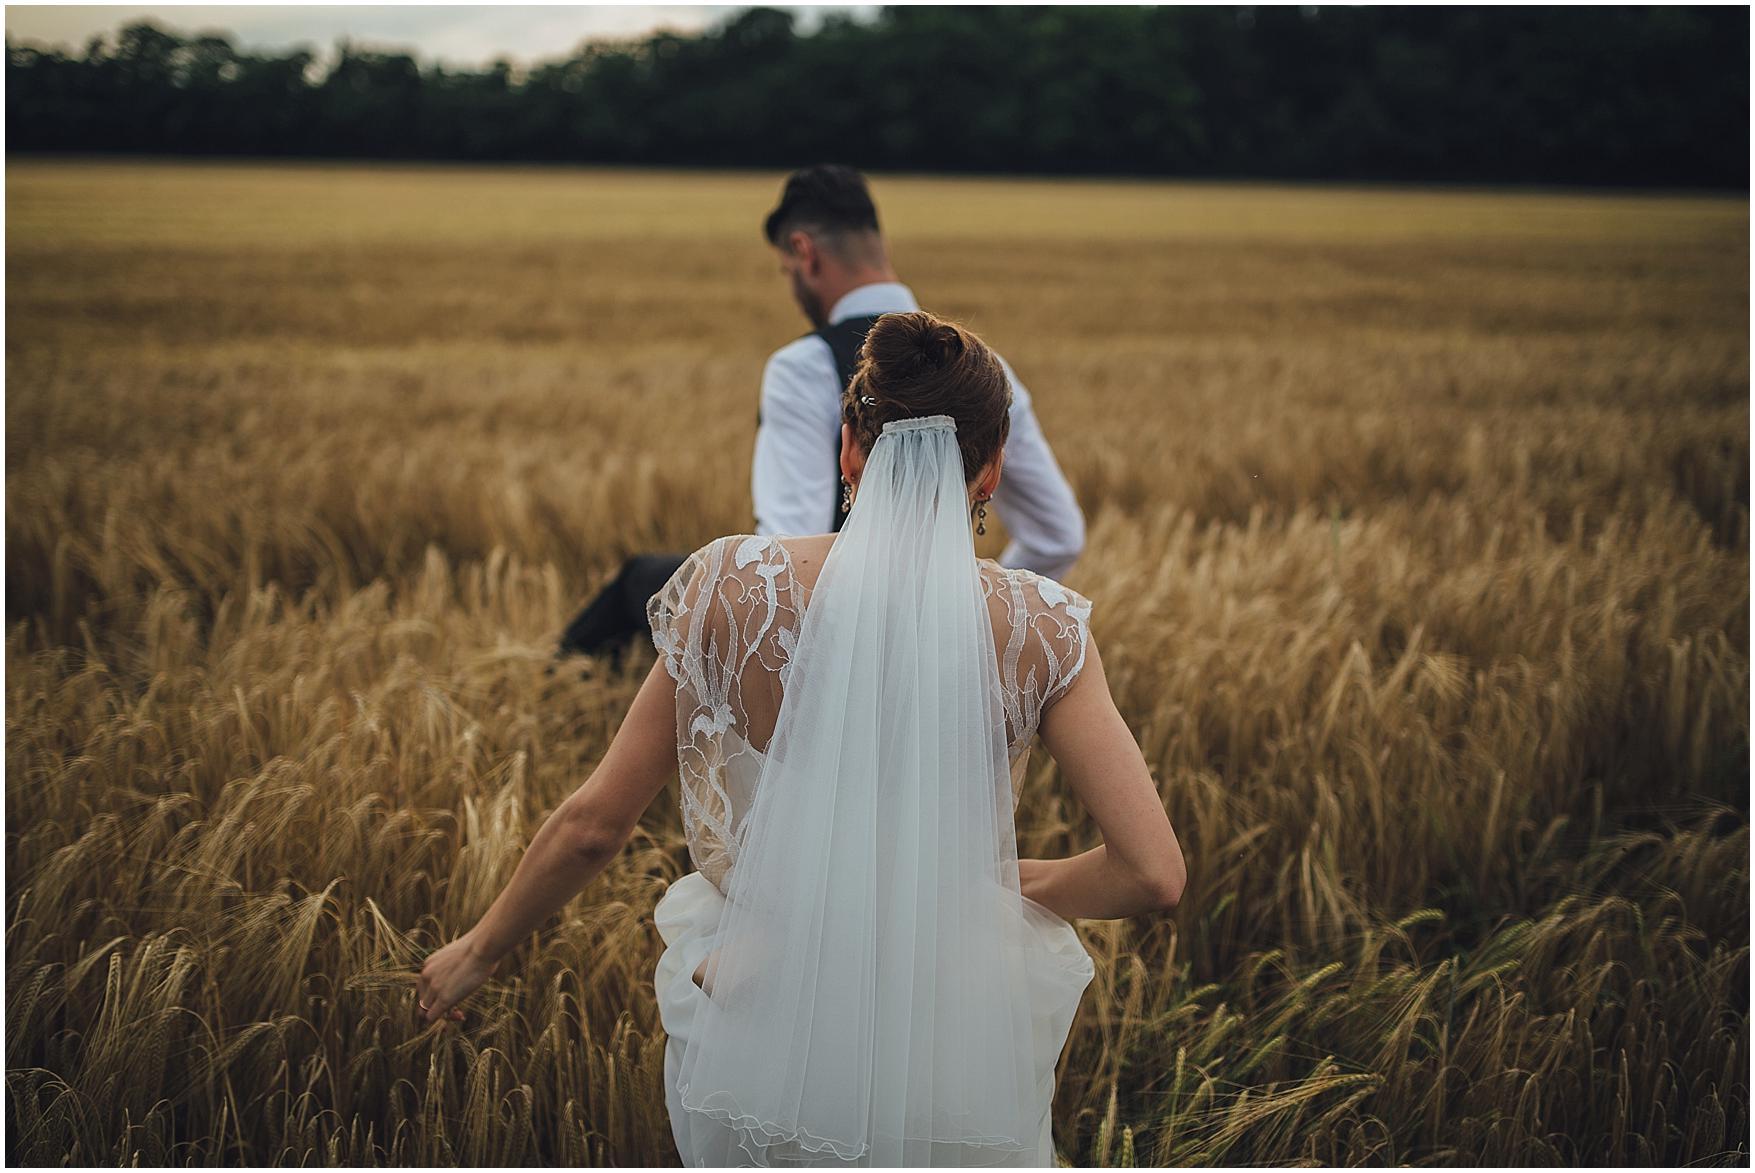 Fotografo Matrimonio Verona - Wedding photographer Verona